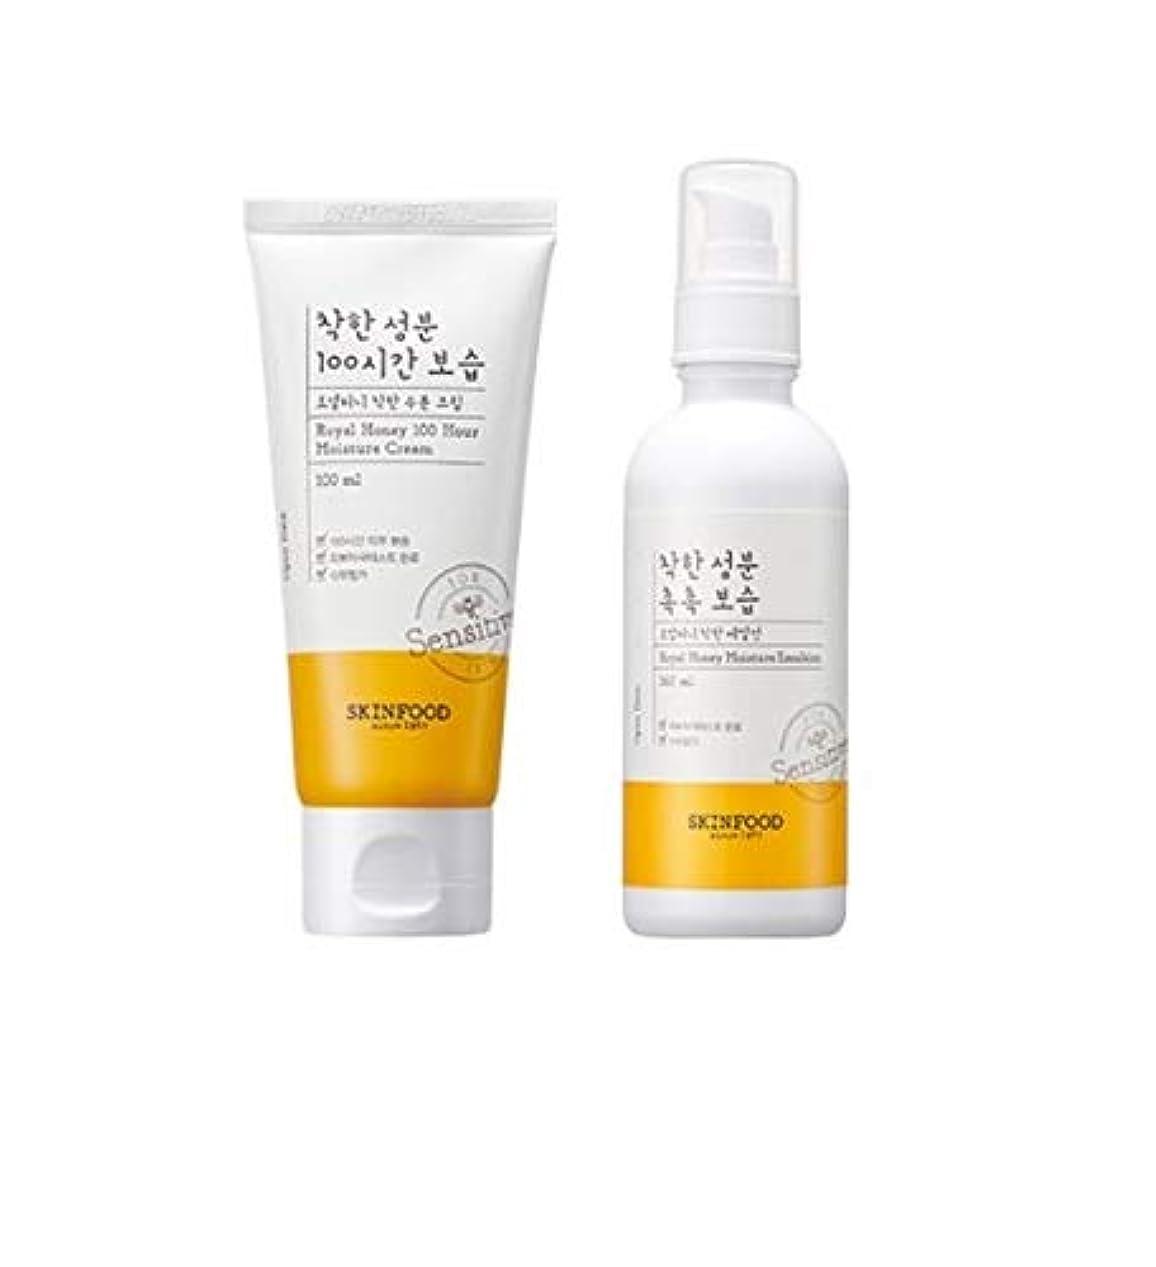 Skinfood ロイヤルハニーグッドモイスチャークリーム100ml +エマルジョン160ml(セット) / Royal Honey Good Moisture Cream 100ml + Emulsion 160ml...